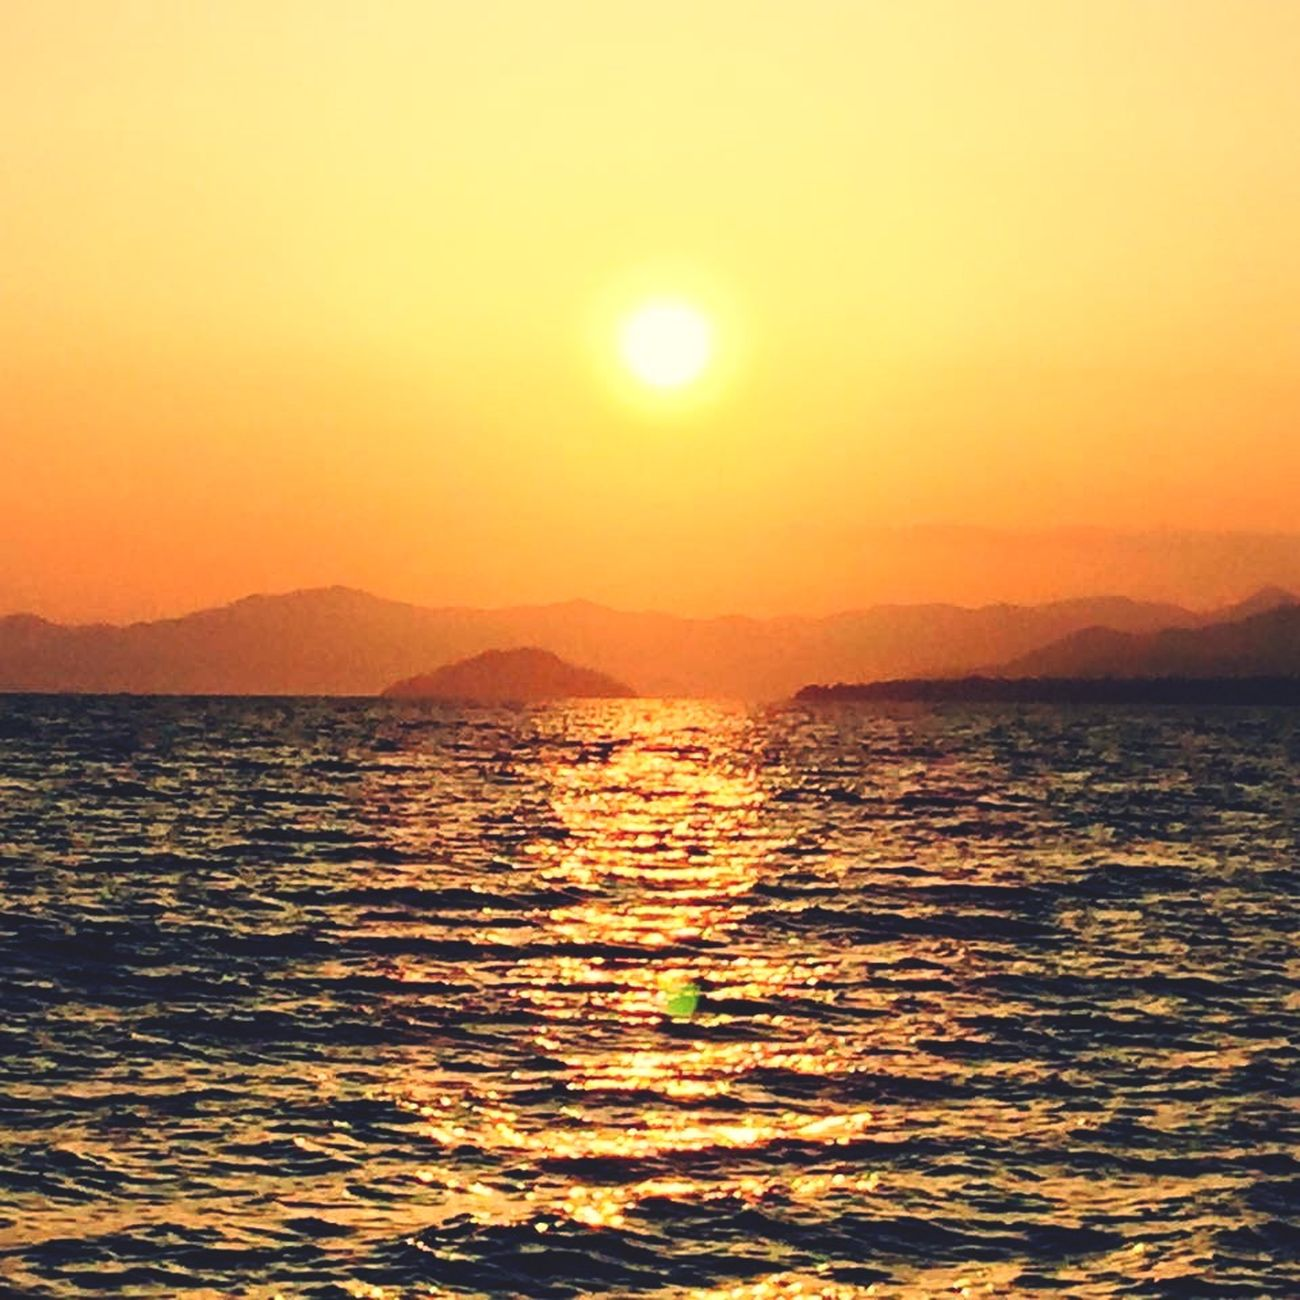 Summer Viewsiews Oceansunset Beachphotography Beautiful Sunstet Heaven on Earth x